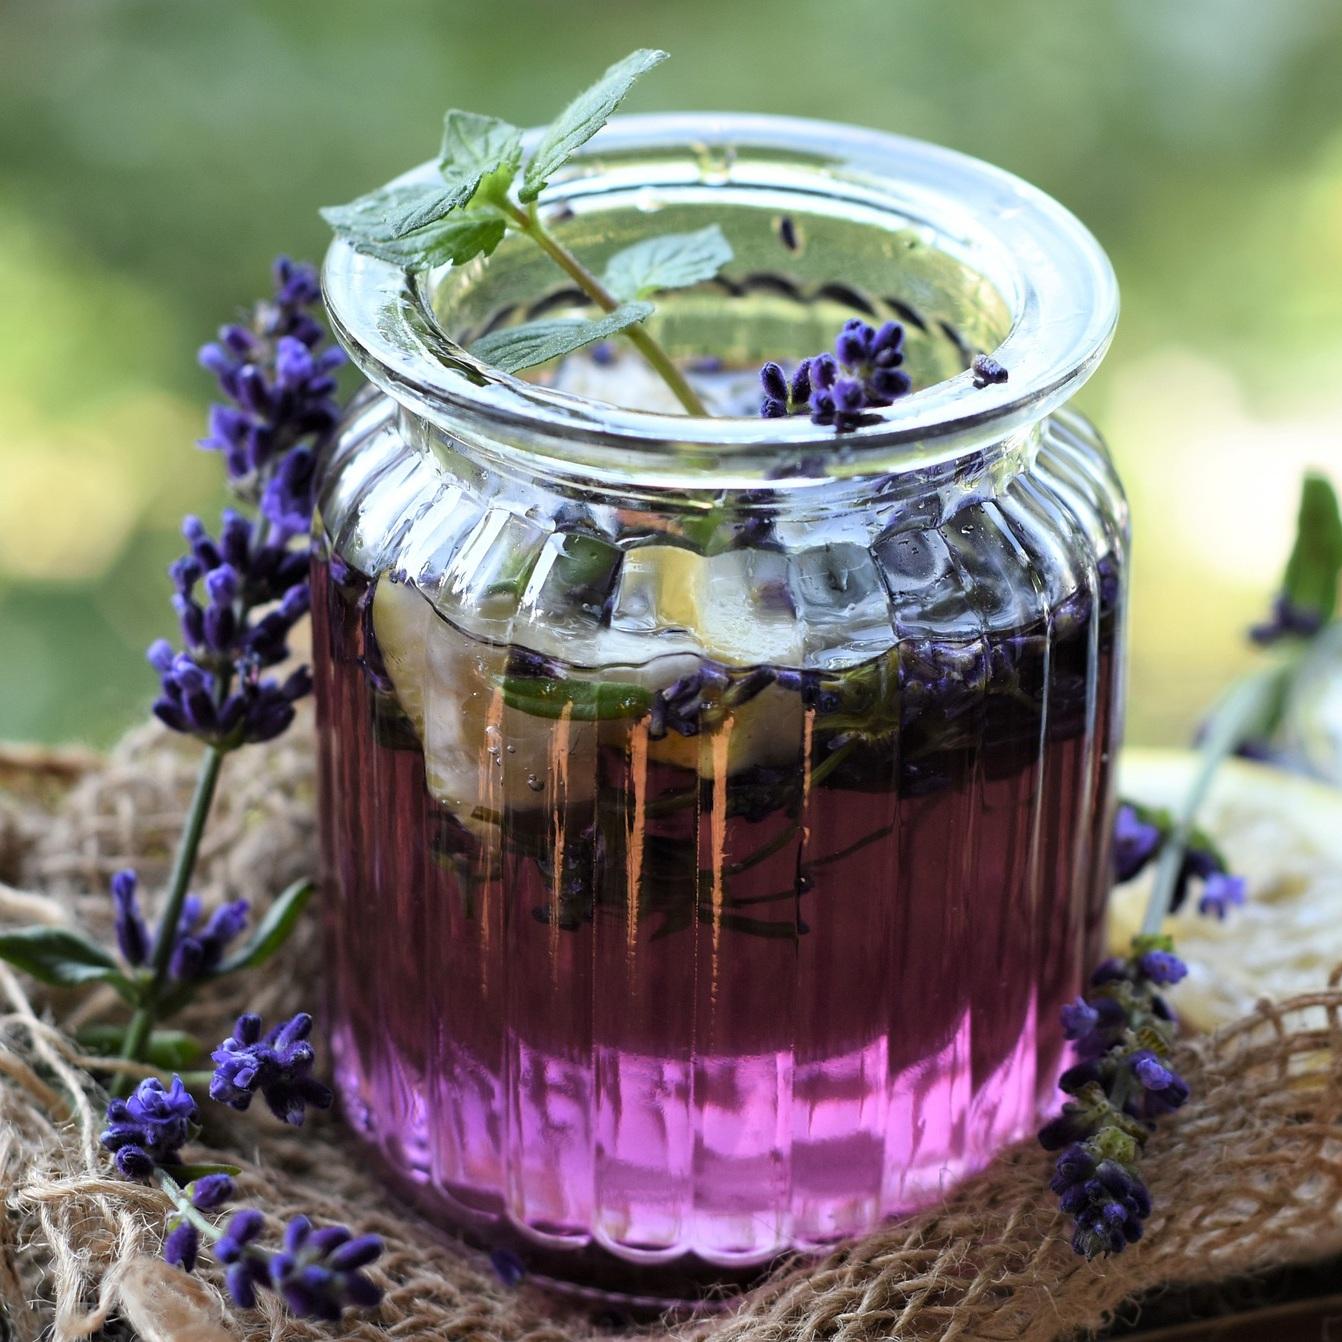 lavender-4355523_1920.jpg